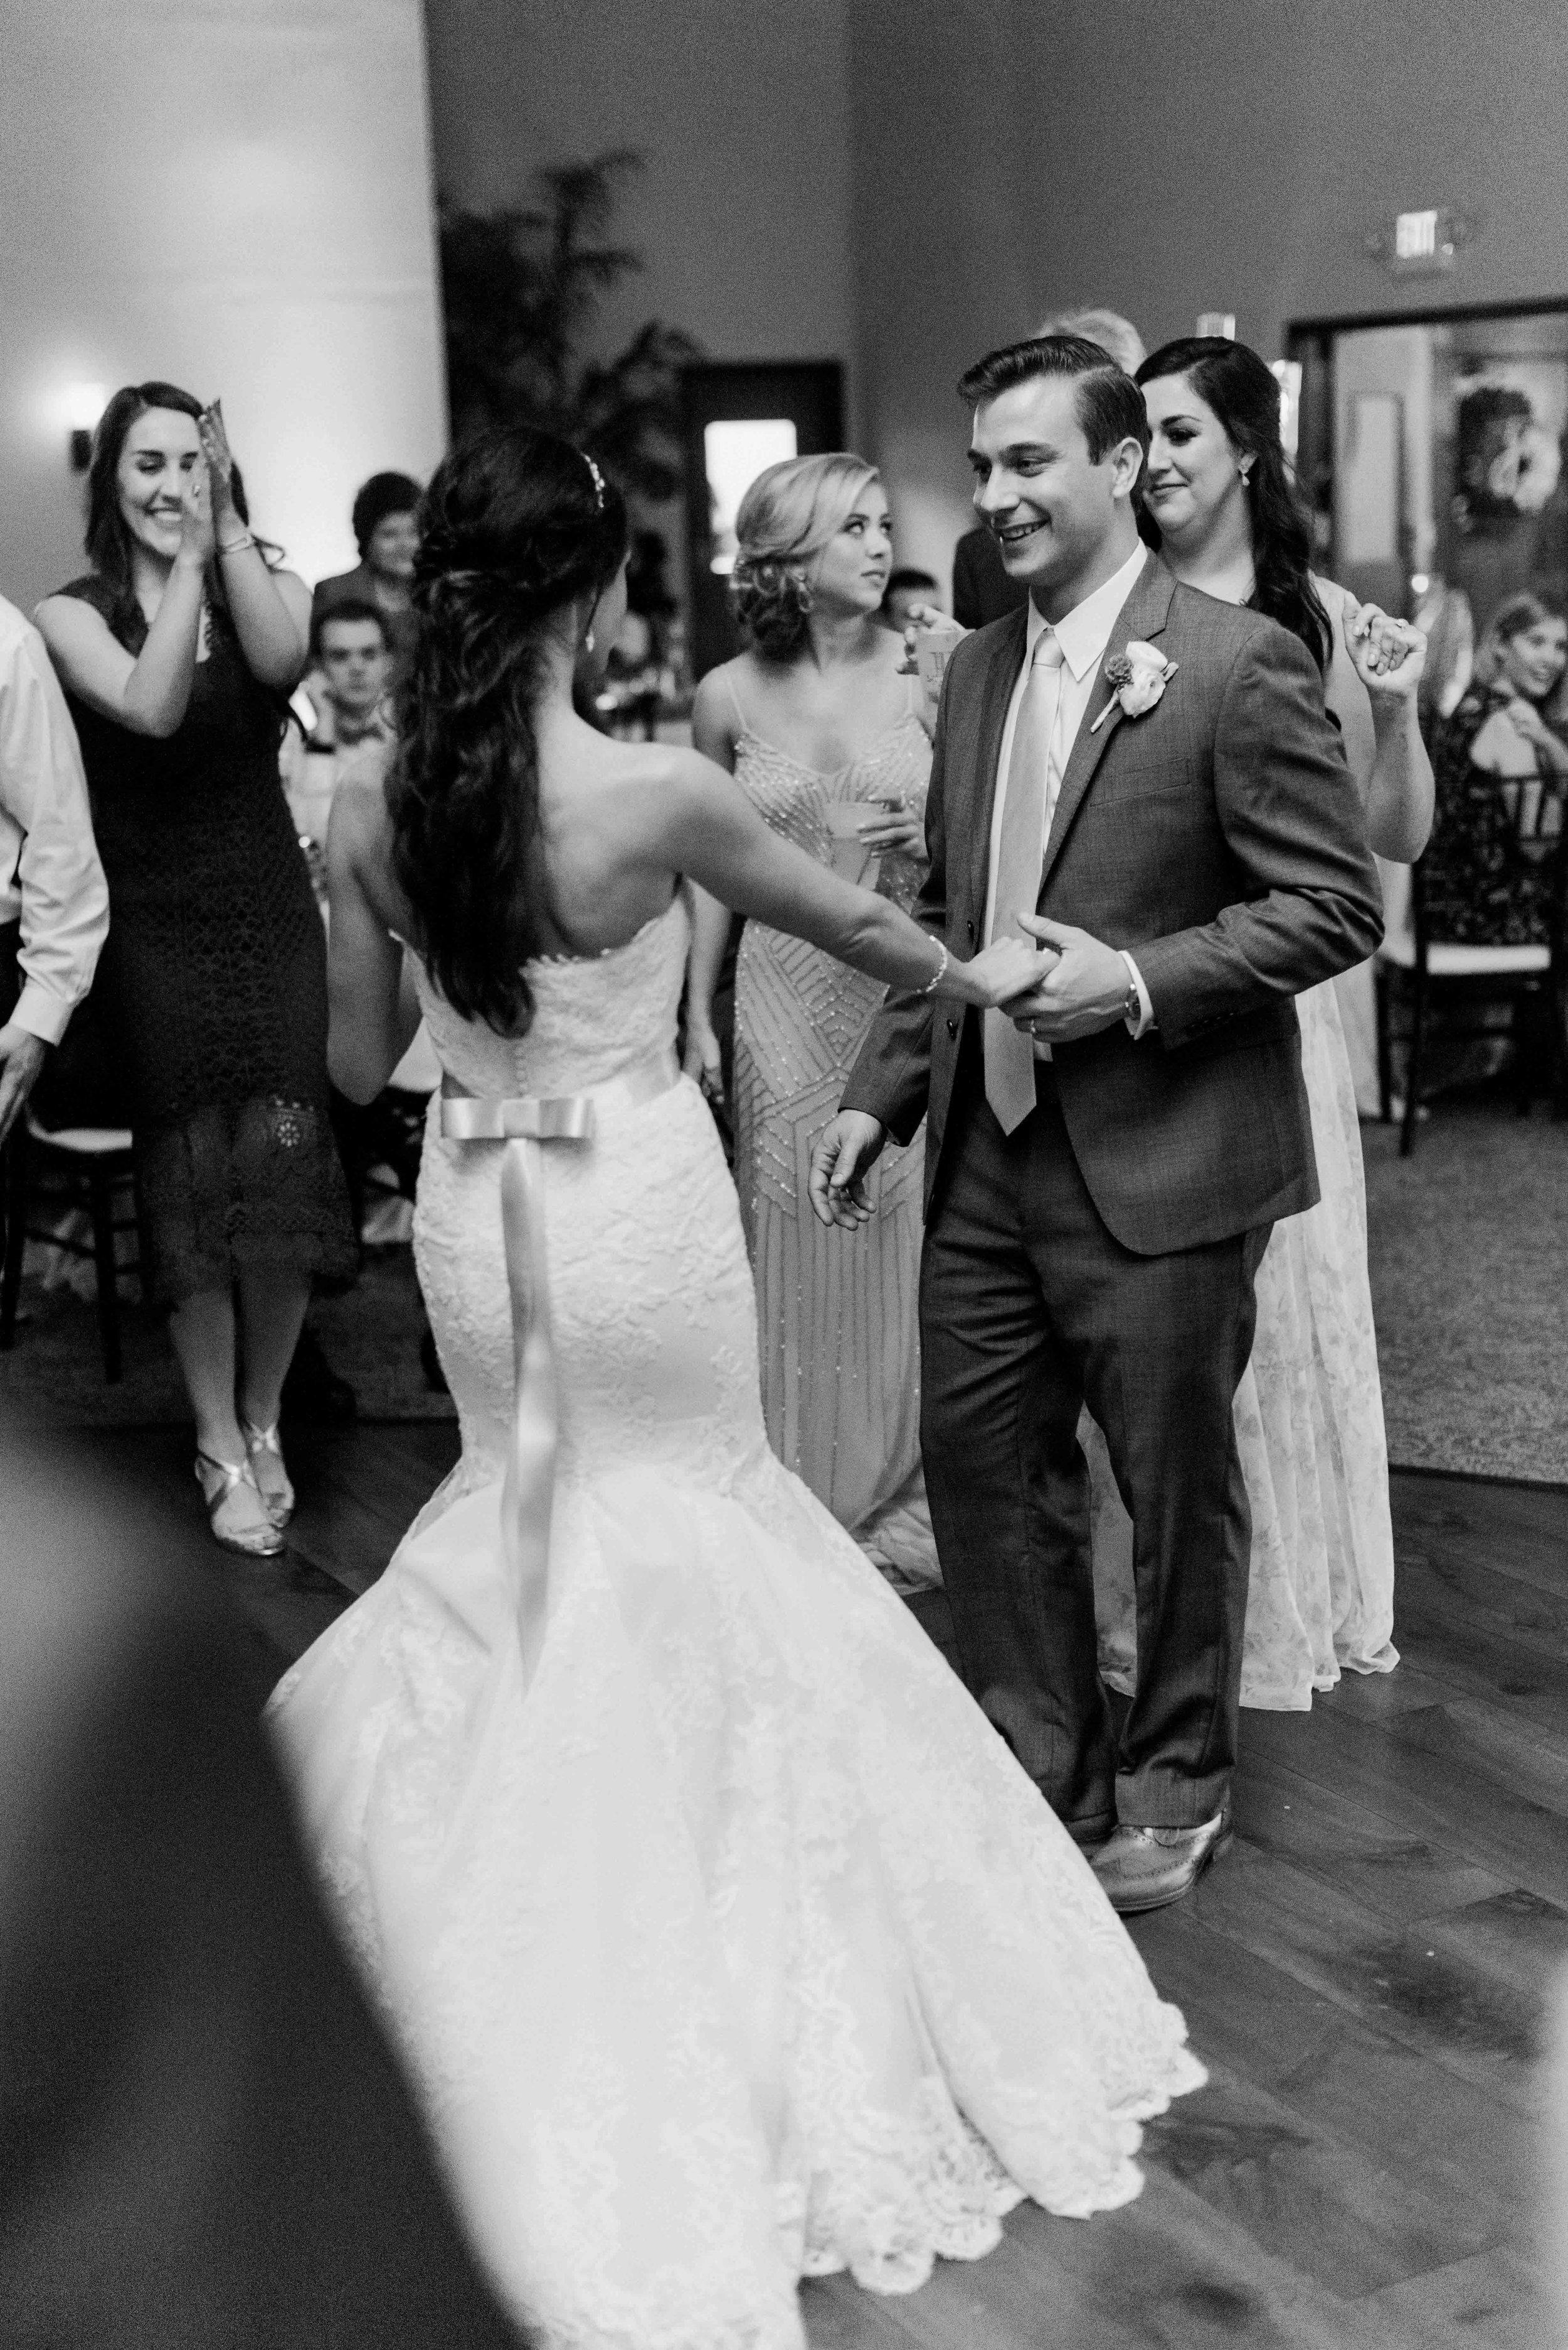 Briscoe-Manor-Houston-Wedding-Photographer-Modern-Luxury-Weddings-Dana-Fernandez-Photograpy-Fine-Art-Photographer-Houston-Film-Destination-PNW-Wedding-Photographer-17.jpg